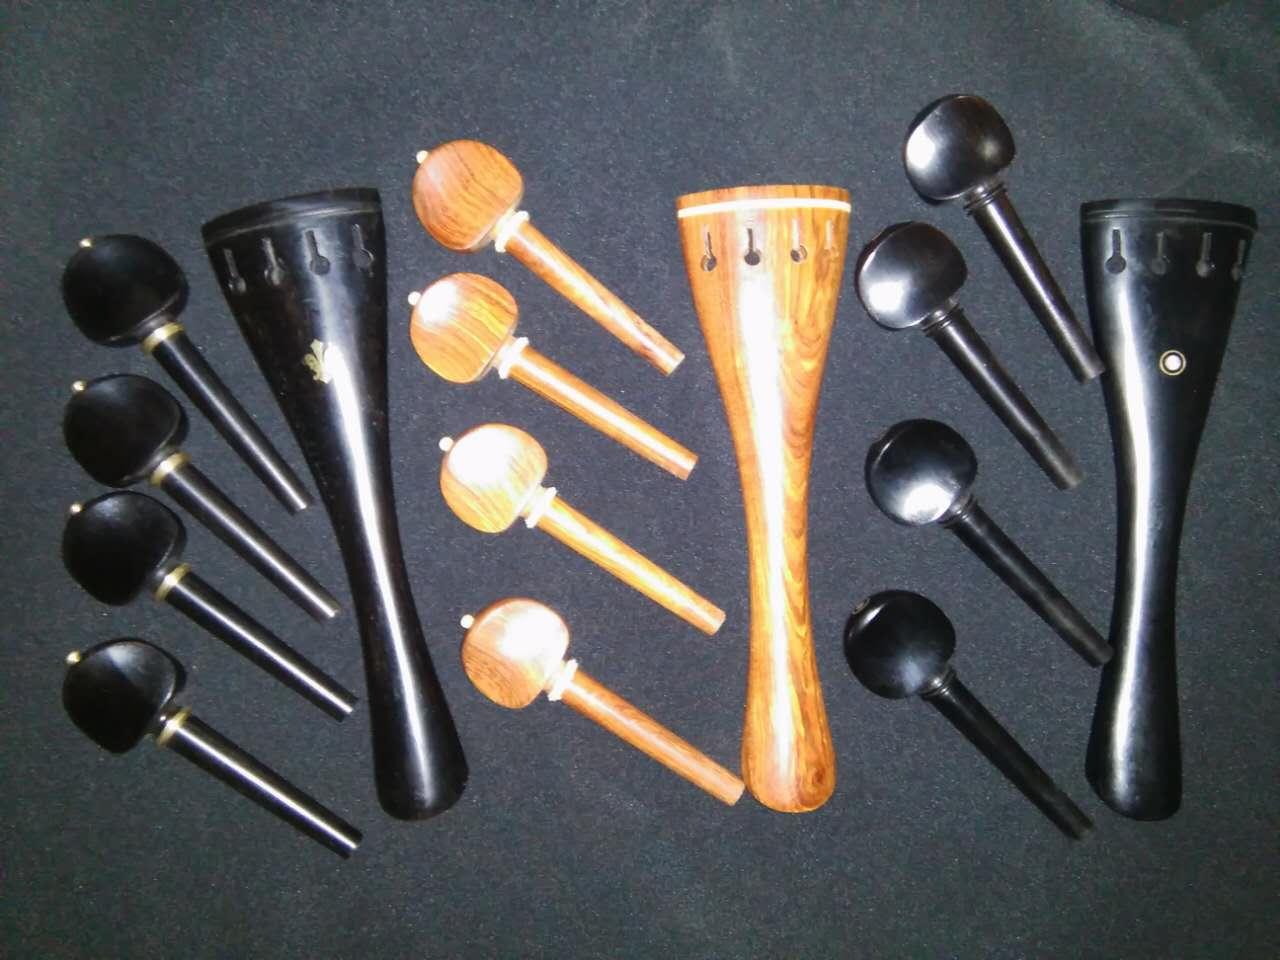 3 Sets Quality Cello parts 4/4 including 2 set ebony 1 set rose wood parts 1 pc nice quality snake wood cello bow ebony frog 4 4 white horse tail hair